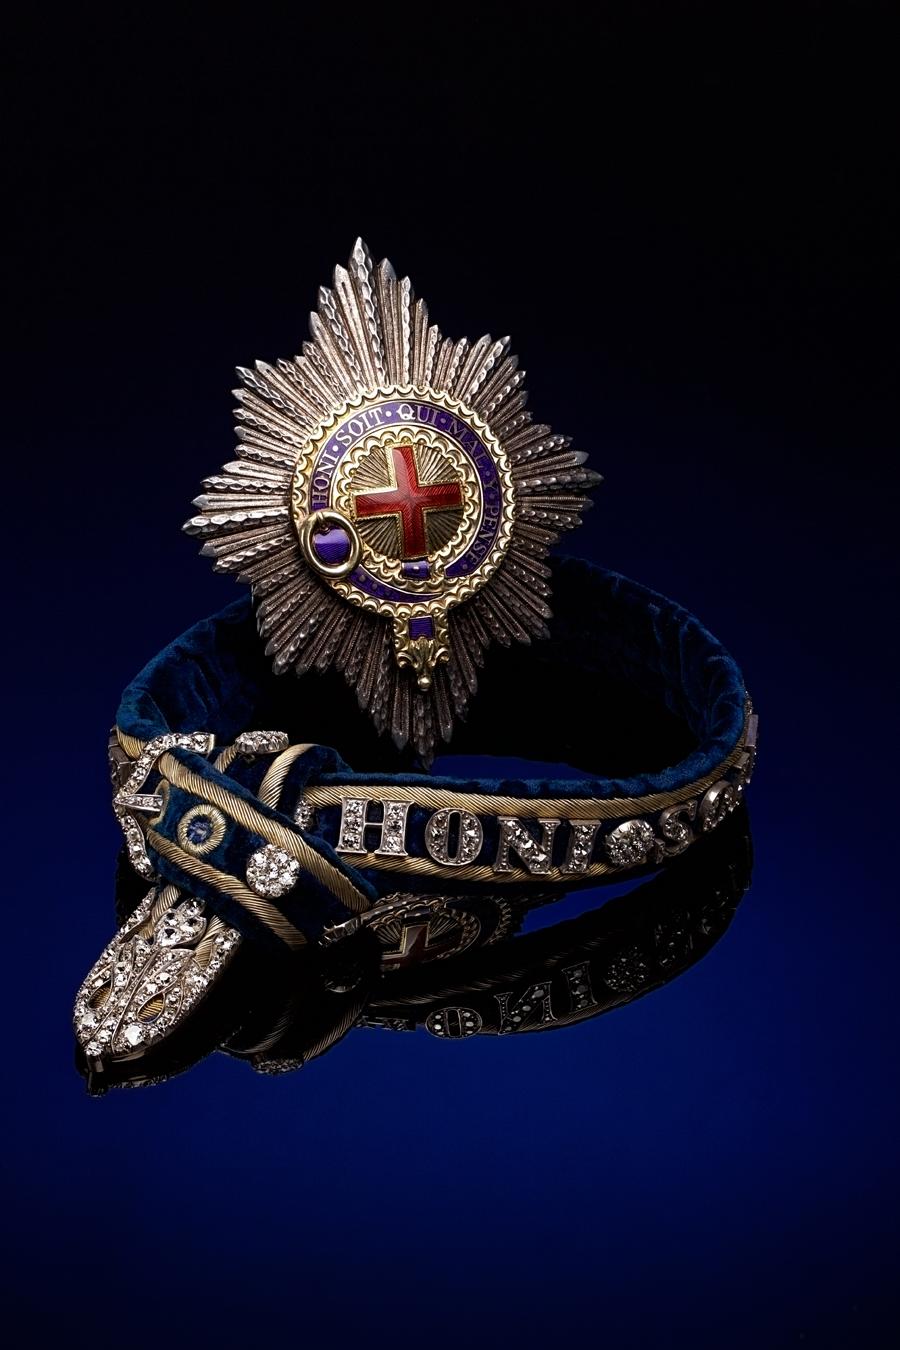 Ордена в Музее орденов